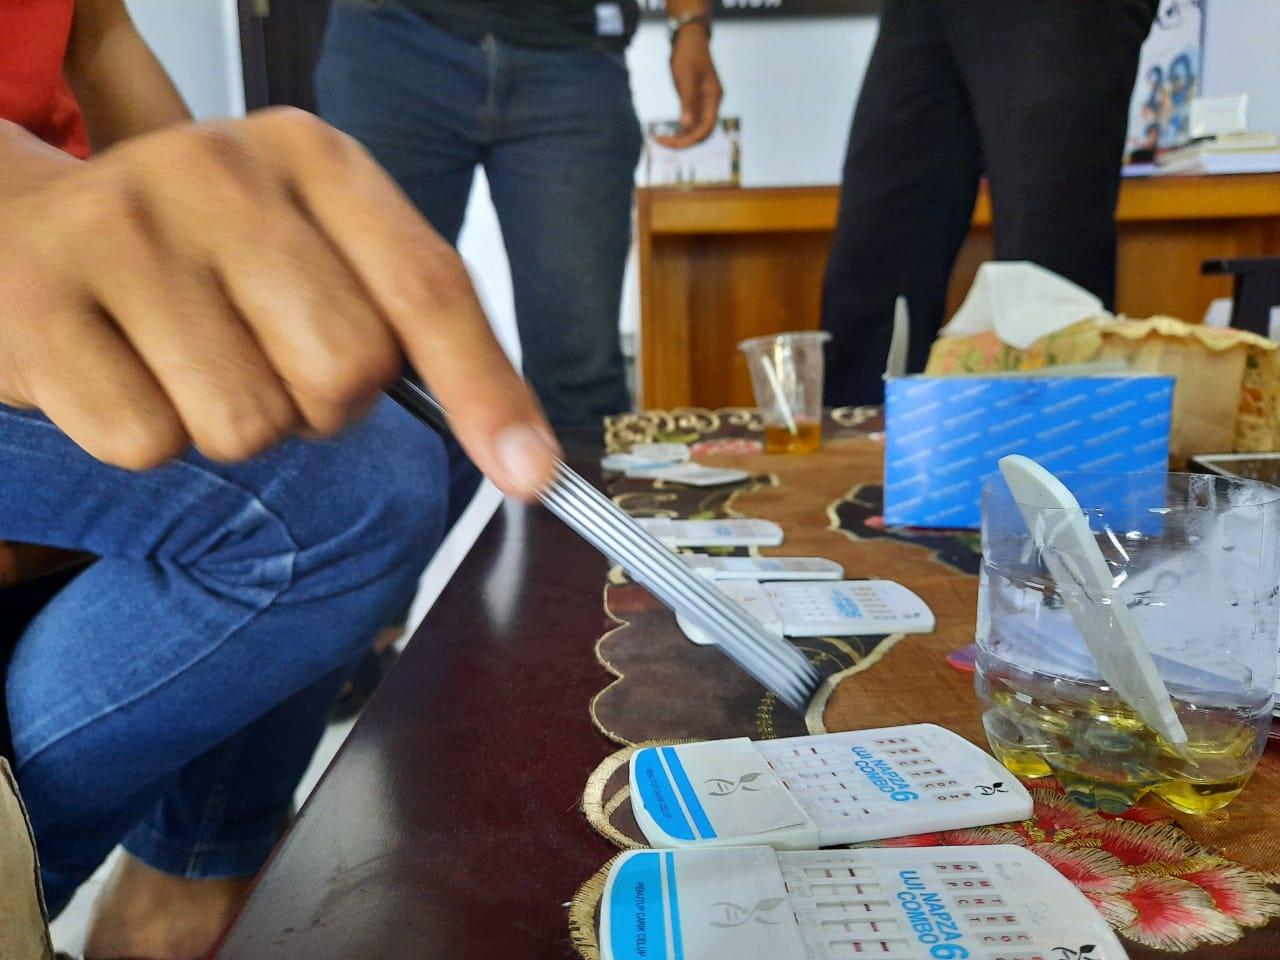 Polres Majene Gelar Tes Urine Dadakan, Pastikan Seluruh Personil Bebas Narkoba